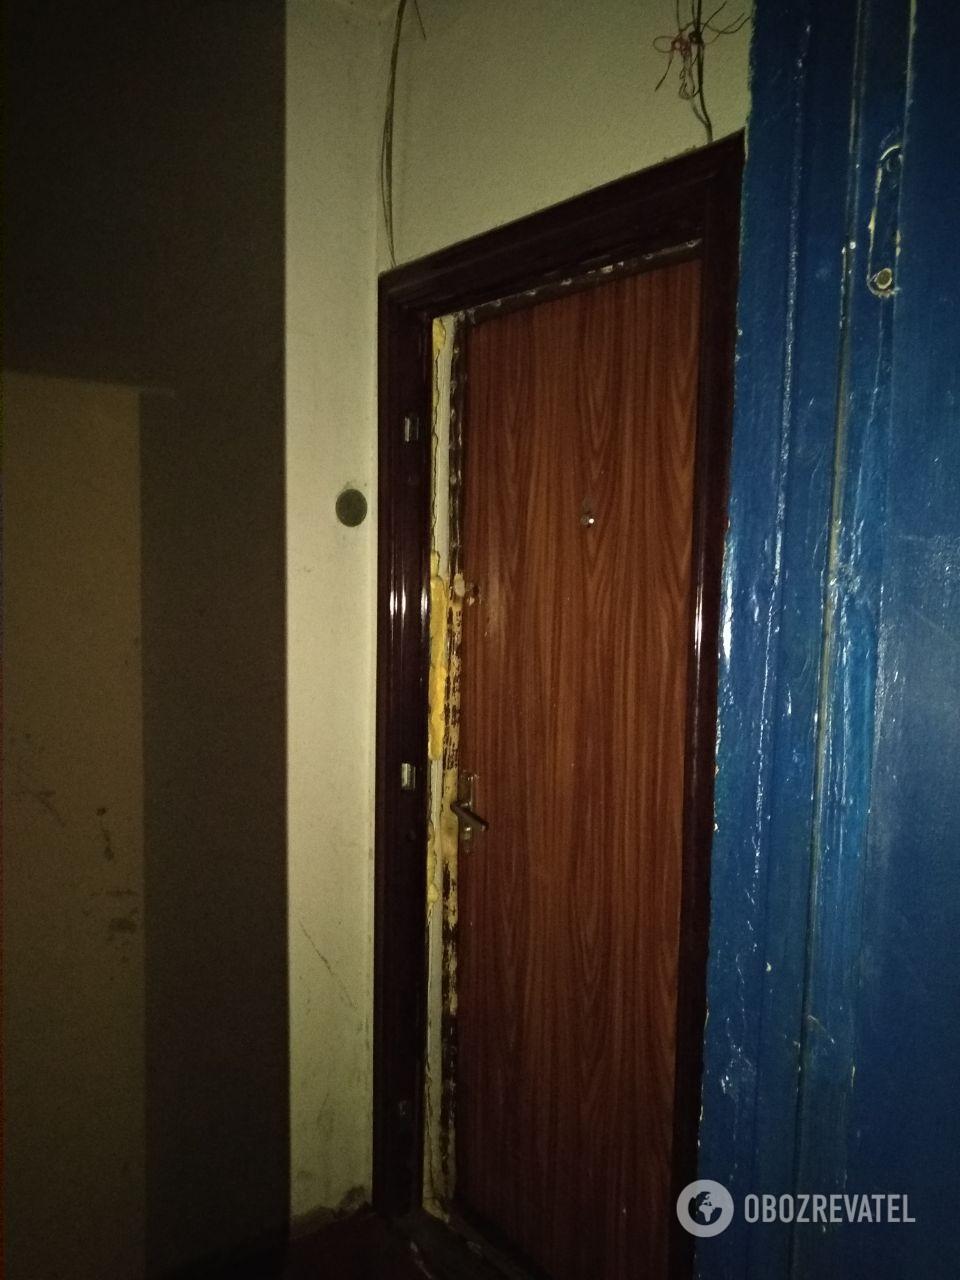 Квартира, де стався злочин